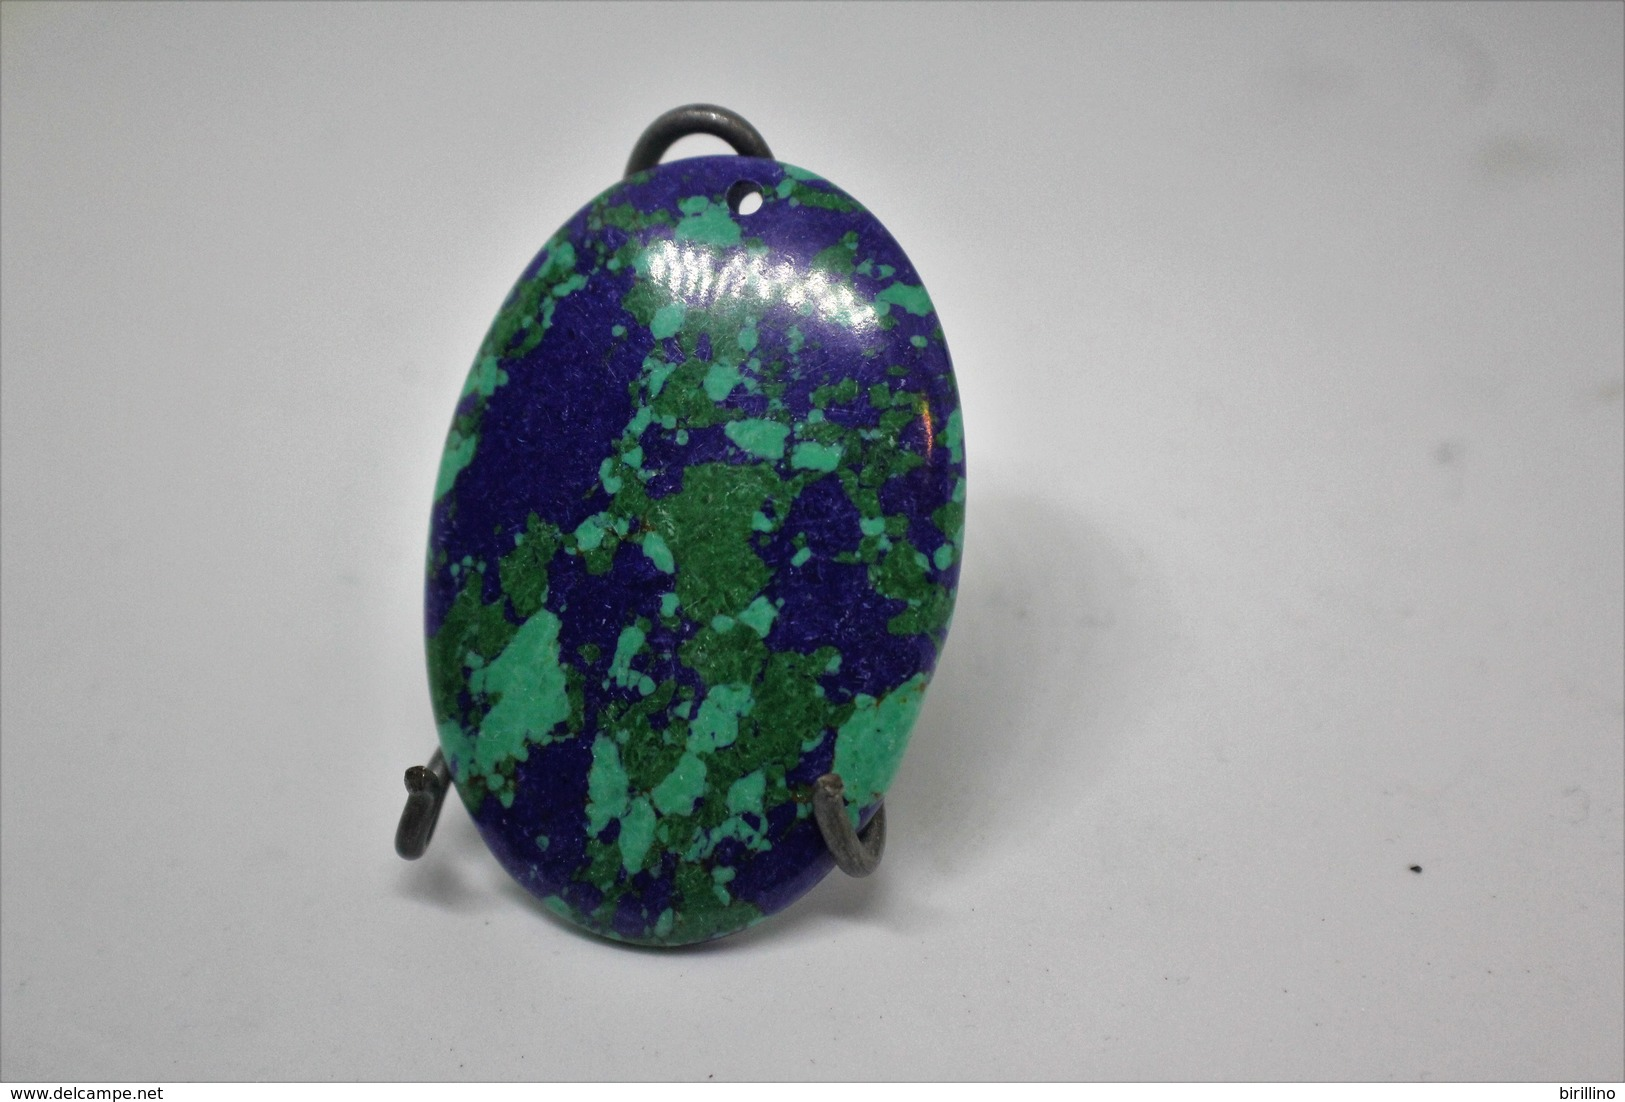 388 - Turchese - Pendente A Forma Ovale Verde E Blu - Turkoois